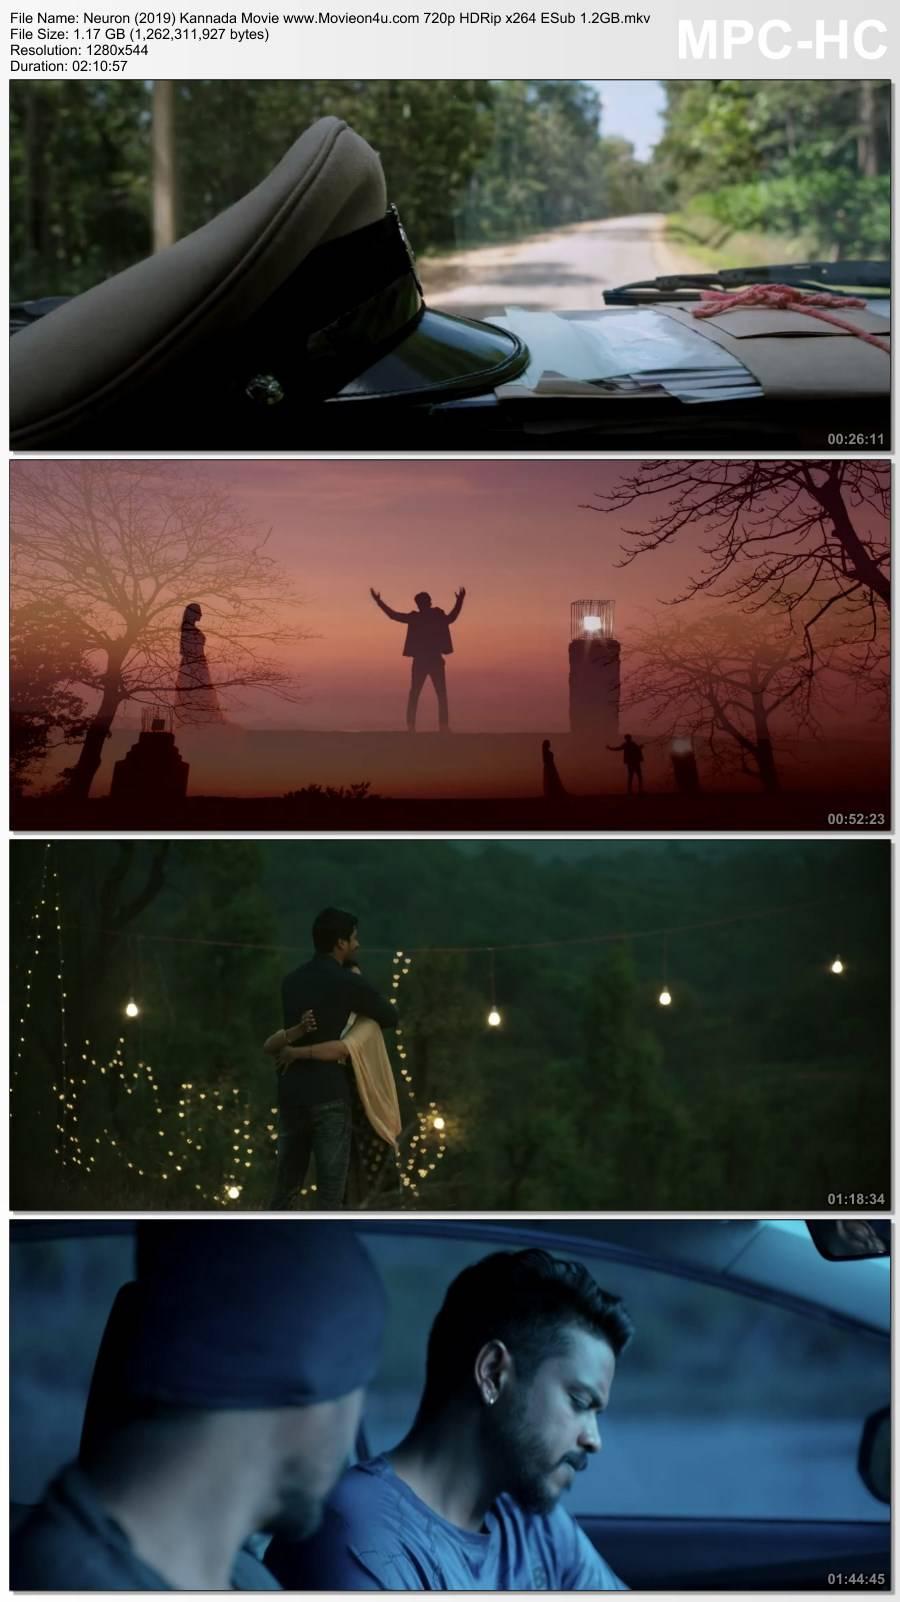 Neuron (2019) Kannada Movie 720p HDRip x264 ESub 1.2GB Download HD